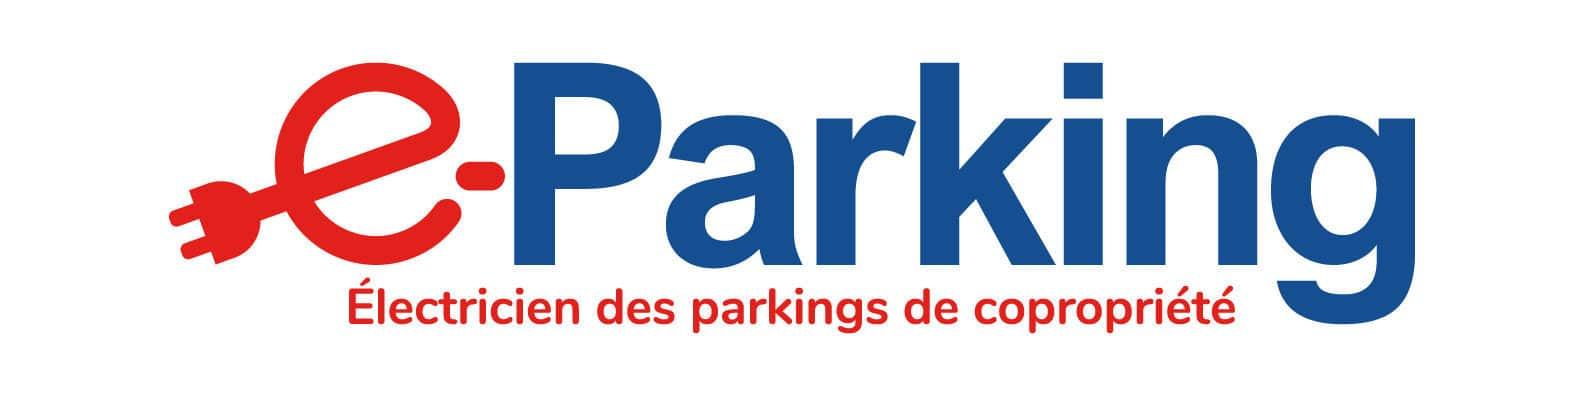 E Parking